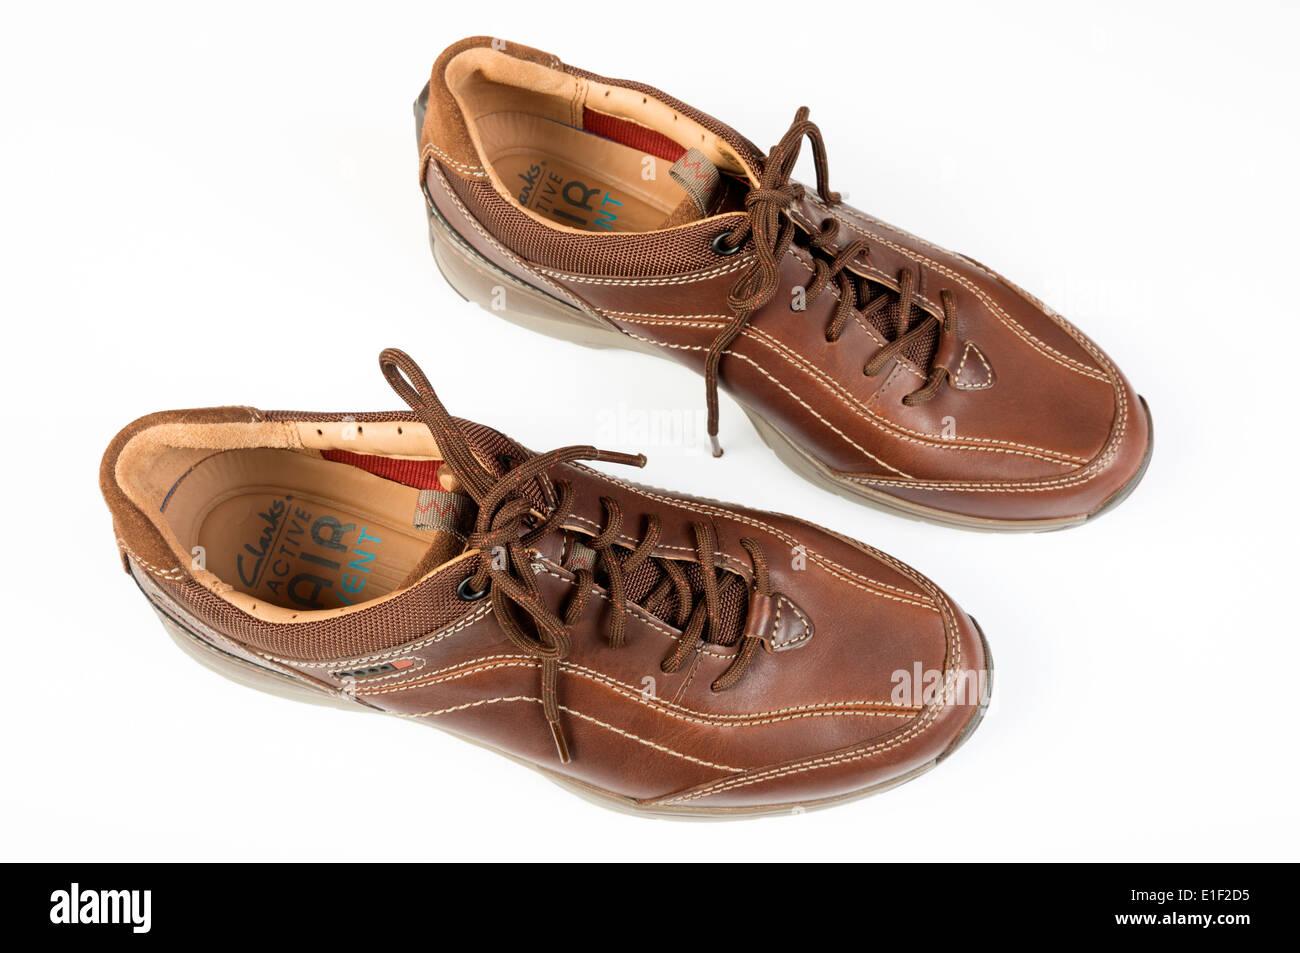 Clarks Active Mens Shoes Imágenes De Stock & Clarks Active